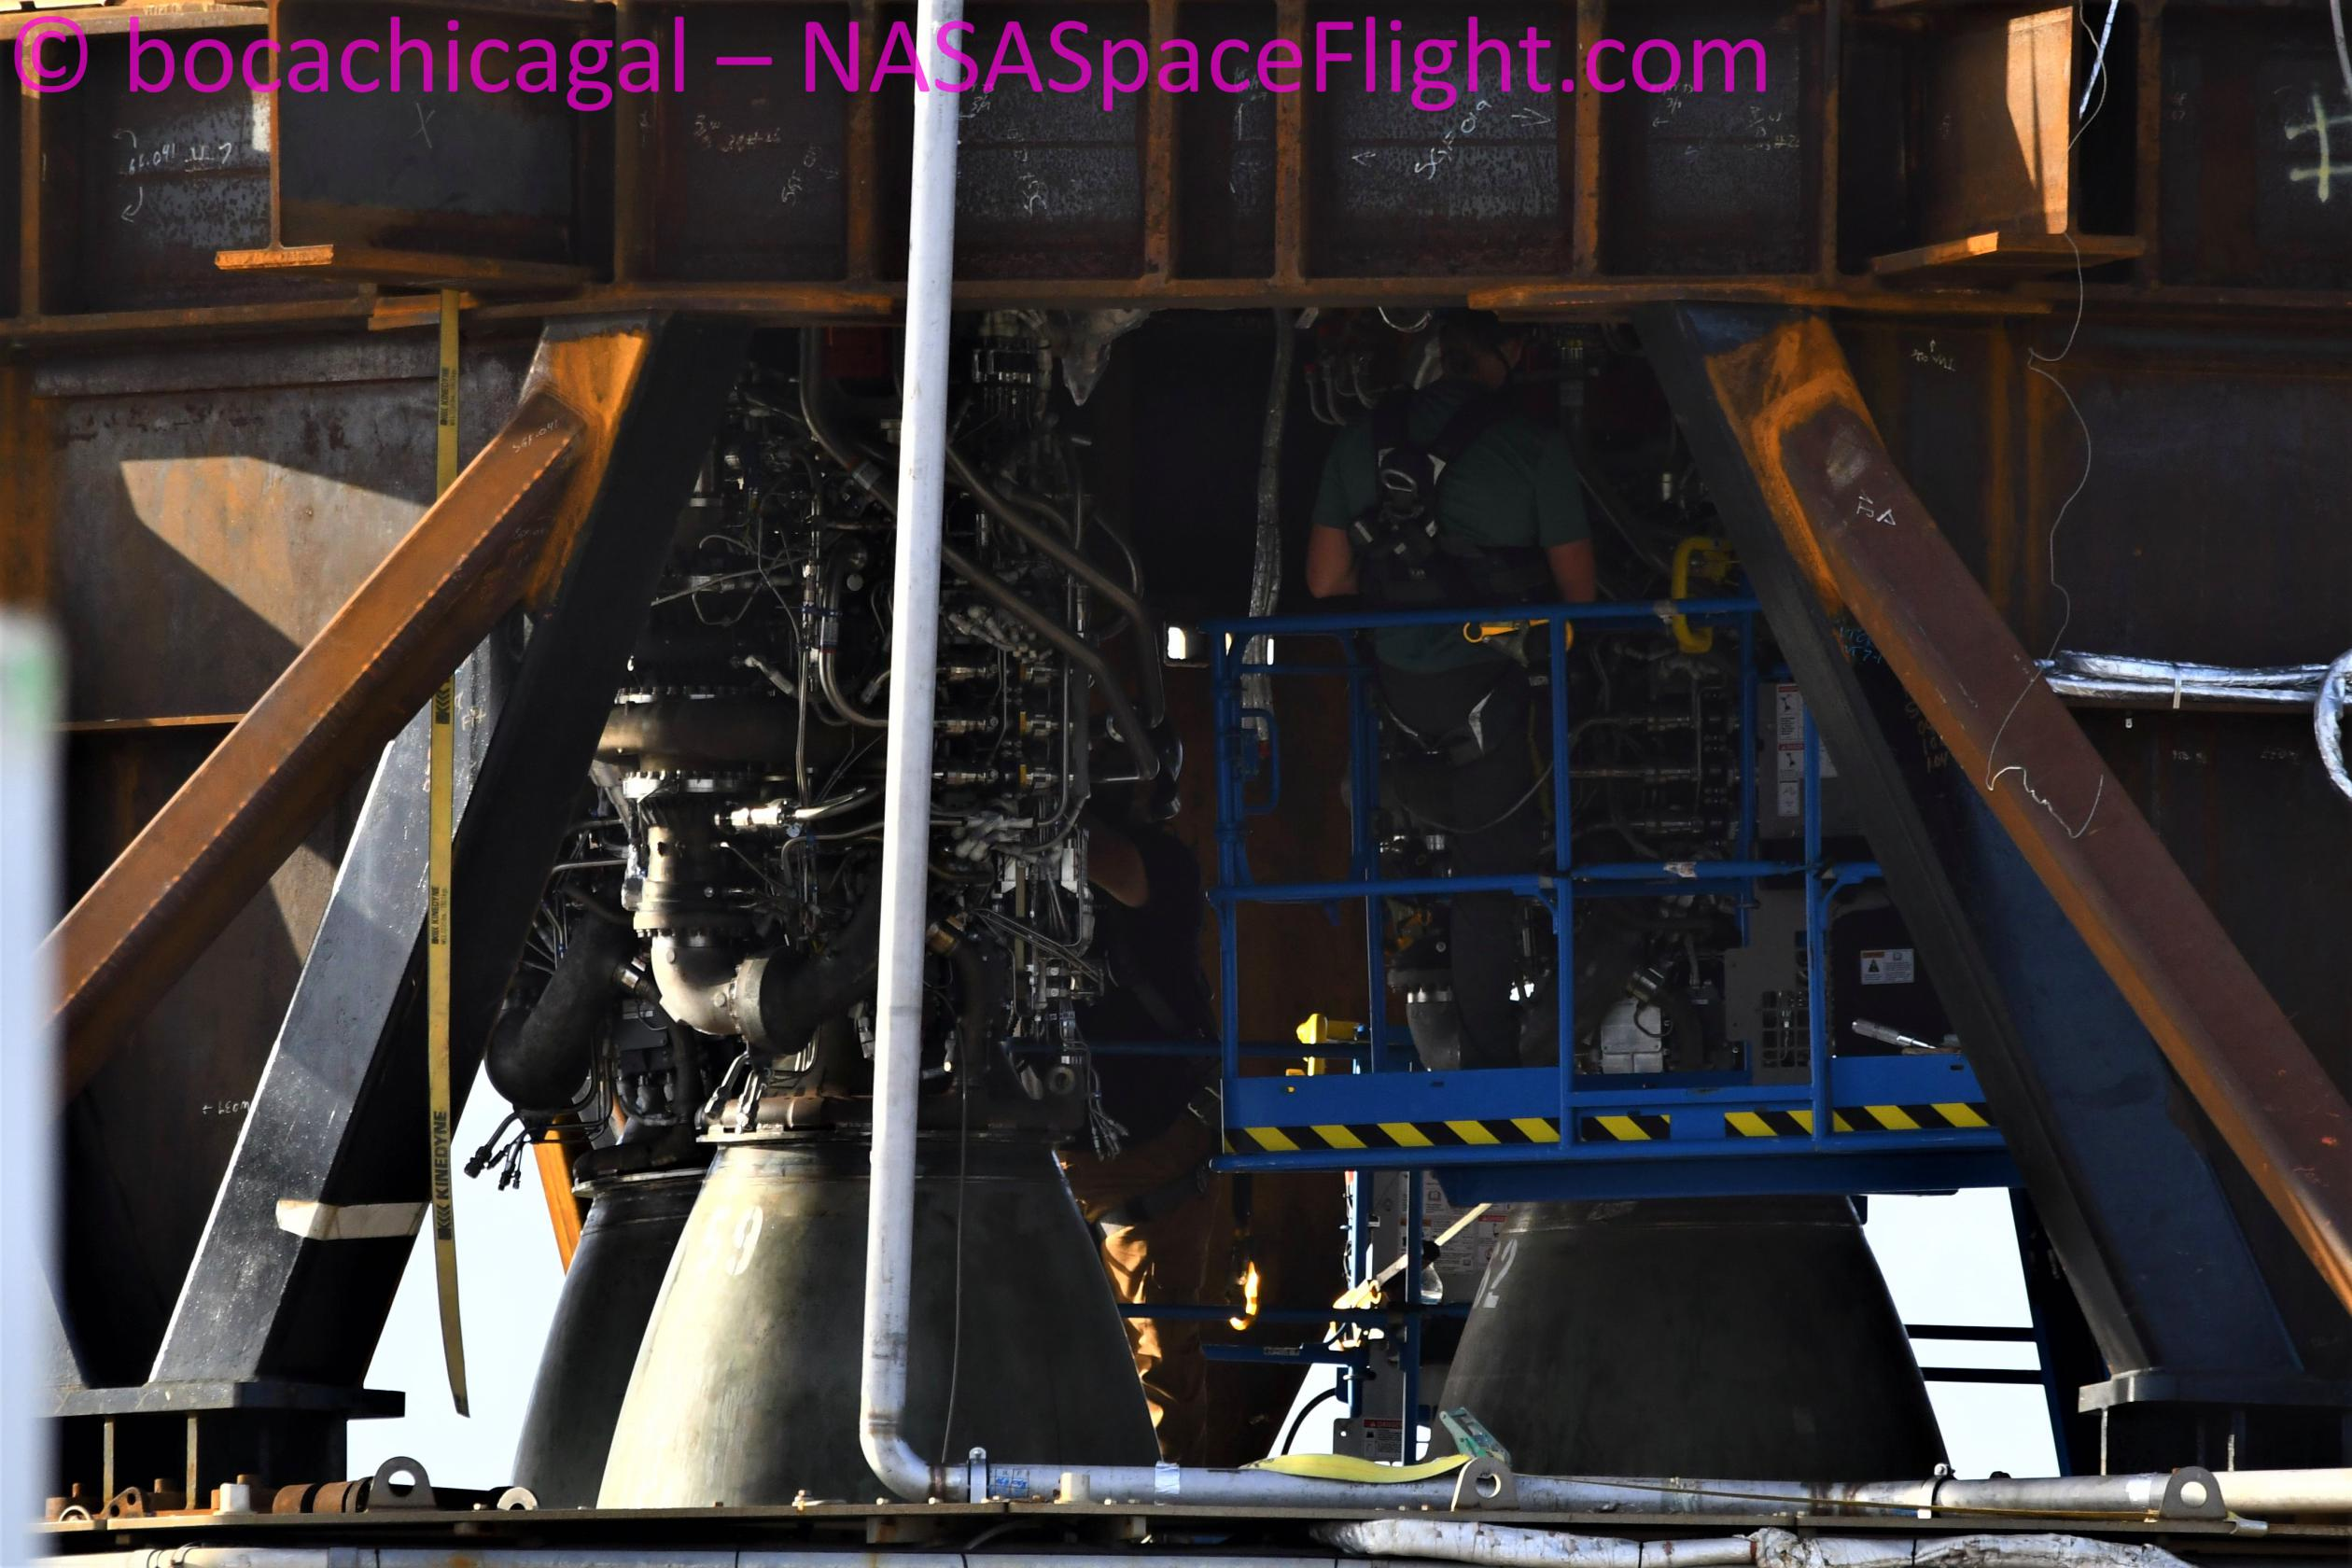 Starship Boca Chica 071321 (NASASpaceflight – bocachicagal) B3 Raptor 57 59 62 1 (c)